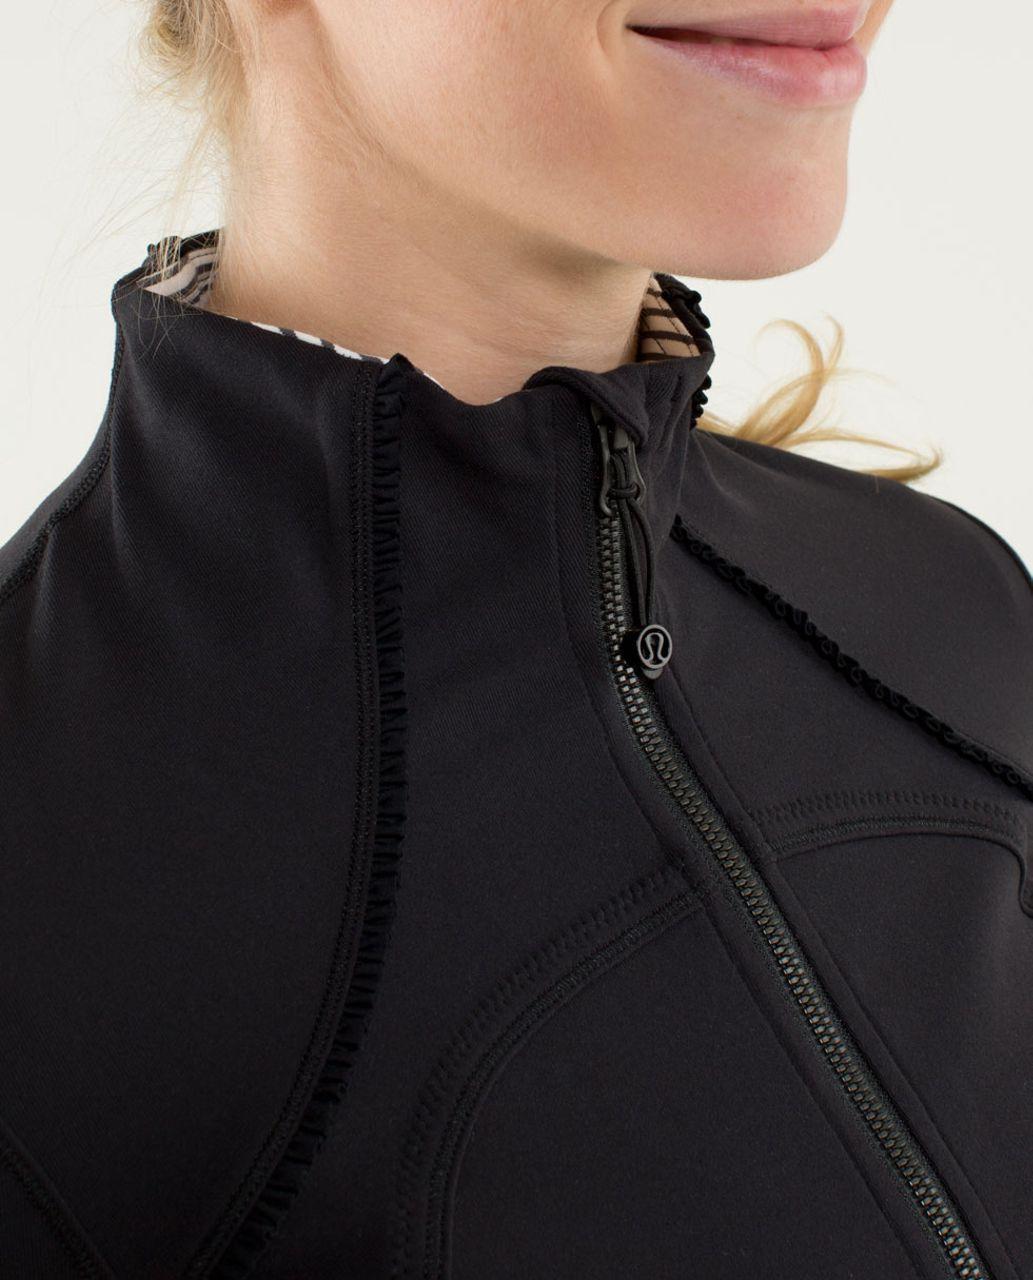 Lululemon Forme Jacket *Ruffled Up - Black / Hyper Stripe Angel Wing